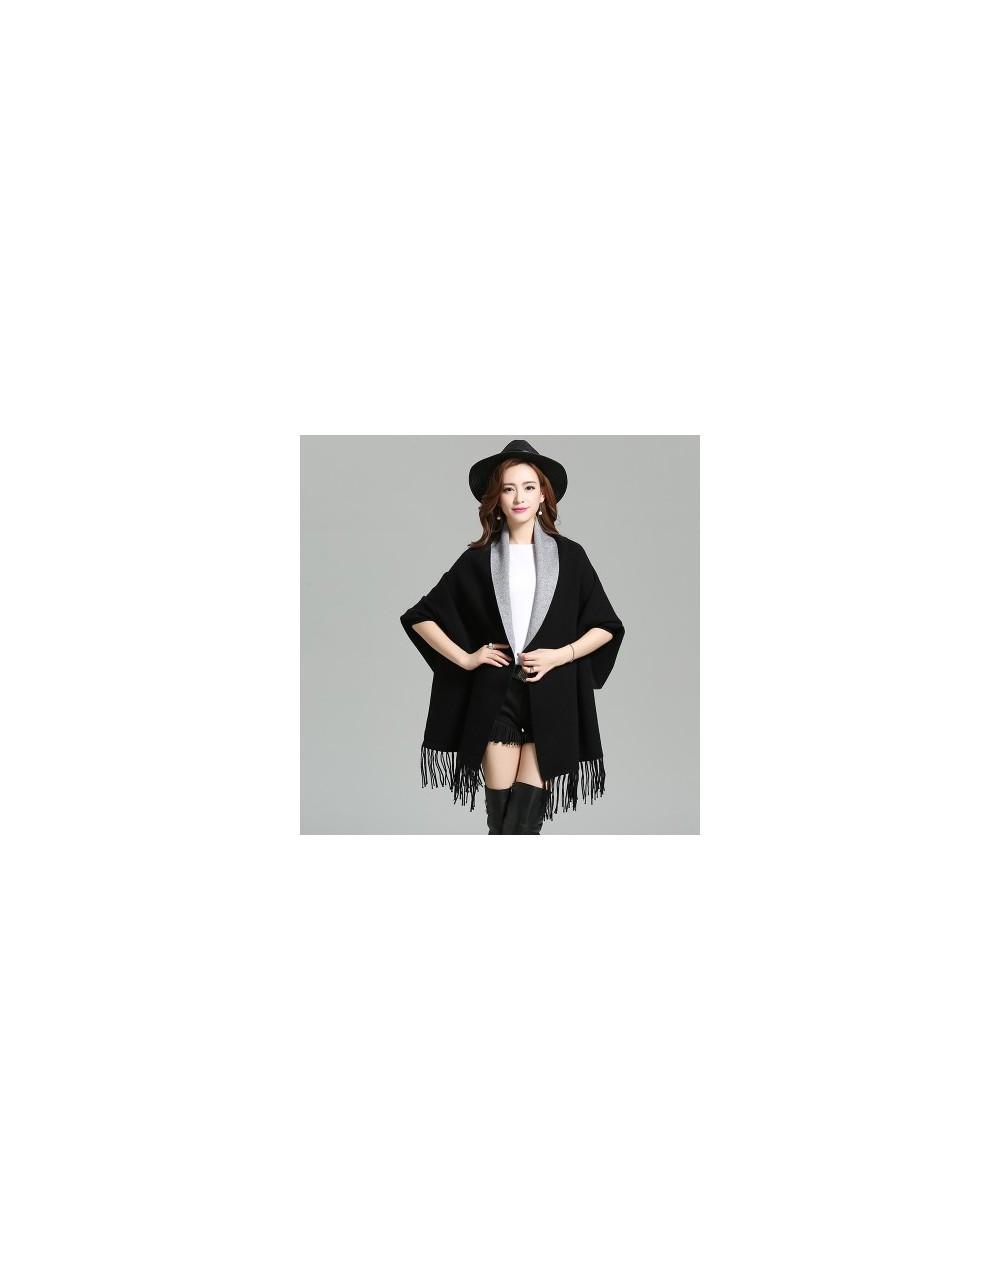 Autumn Korean Plus Size Women Long Loose Sweater Cardigan Tassel Sweater Shawl Coat Fashion Wild Female Knitwear 65881 - 658...